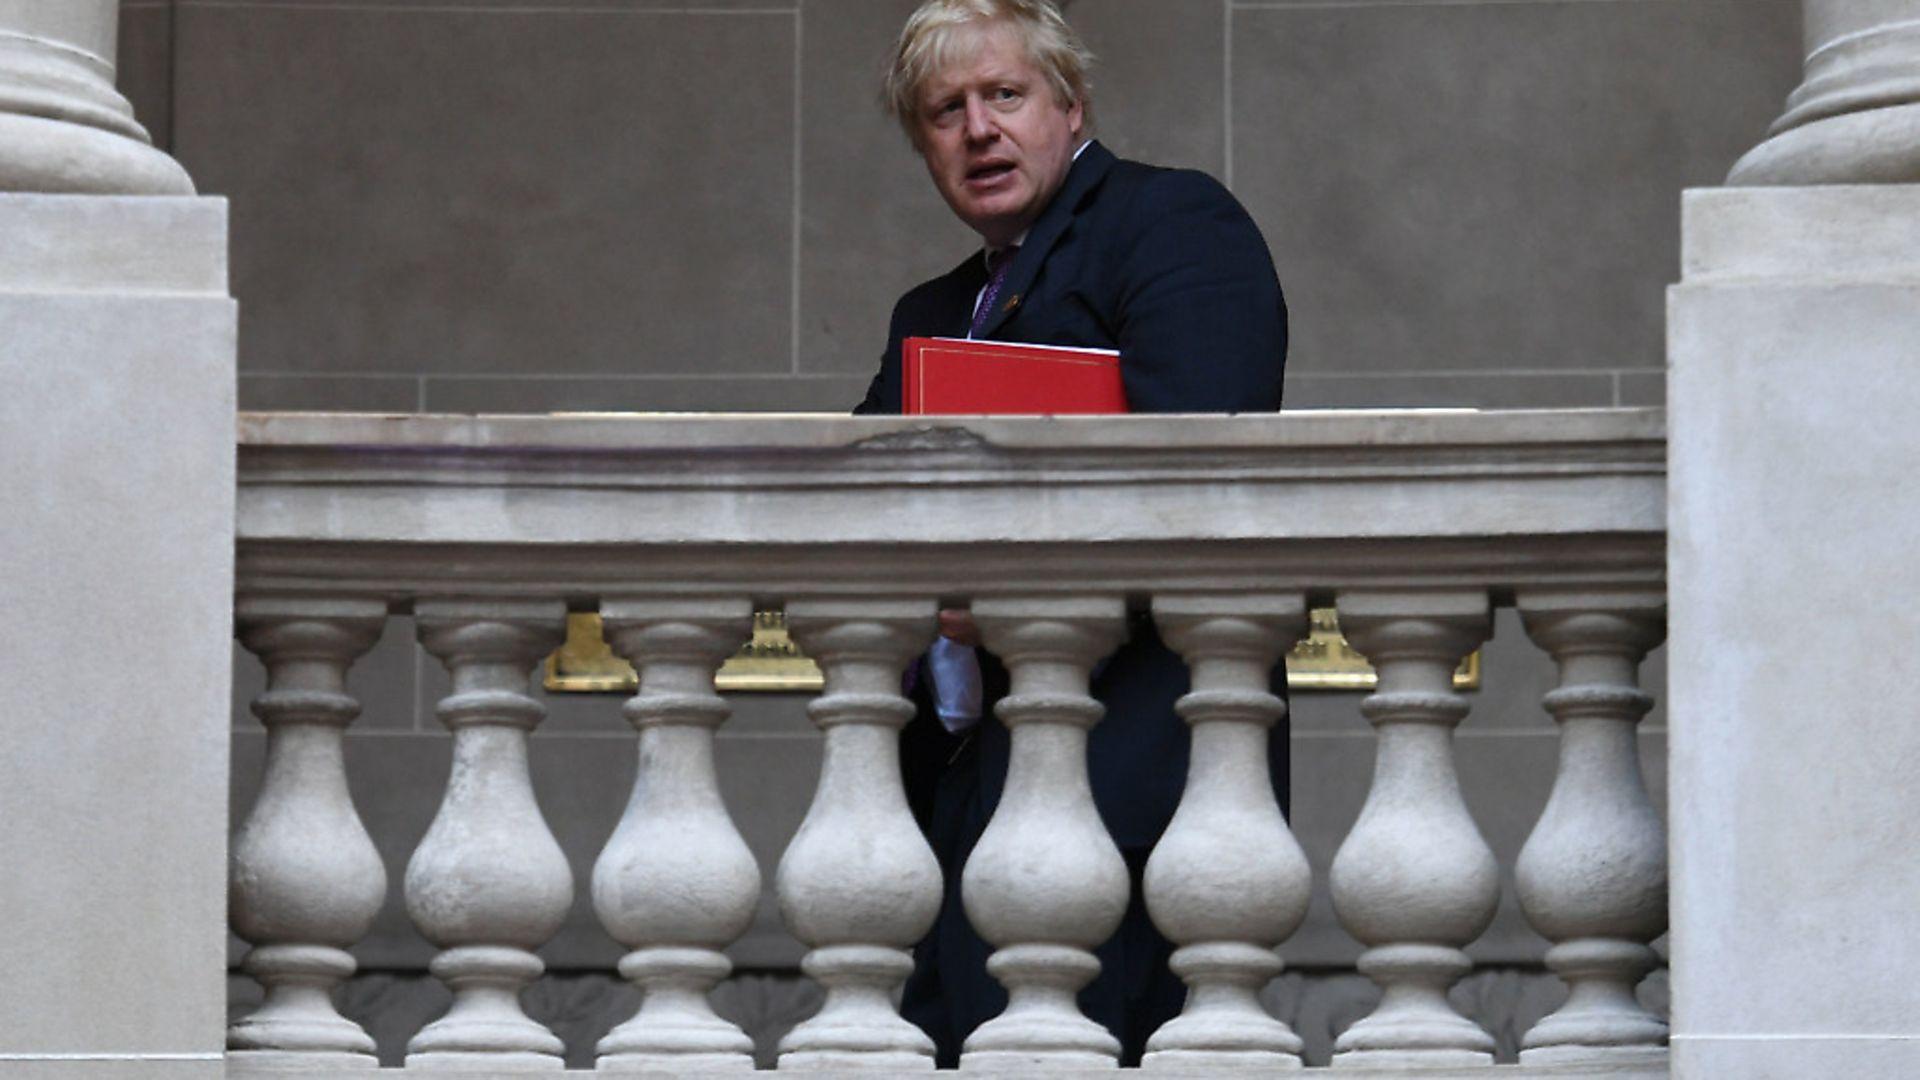 Boris Johnson. Photo: PA / Stefan Rousseau - Credit: PA Wire/PA Images